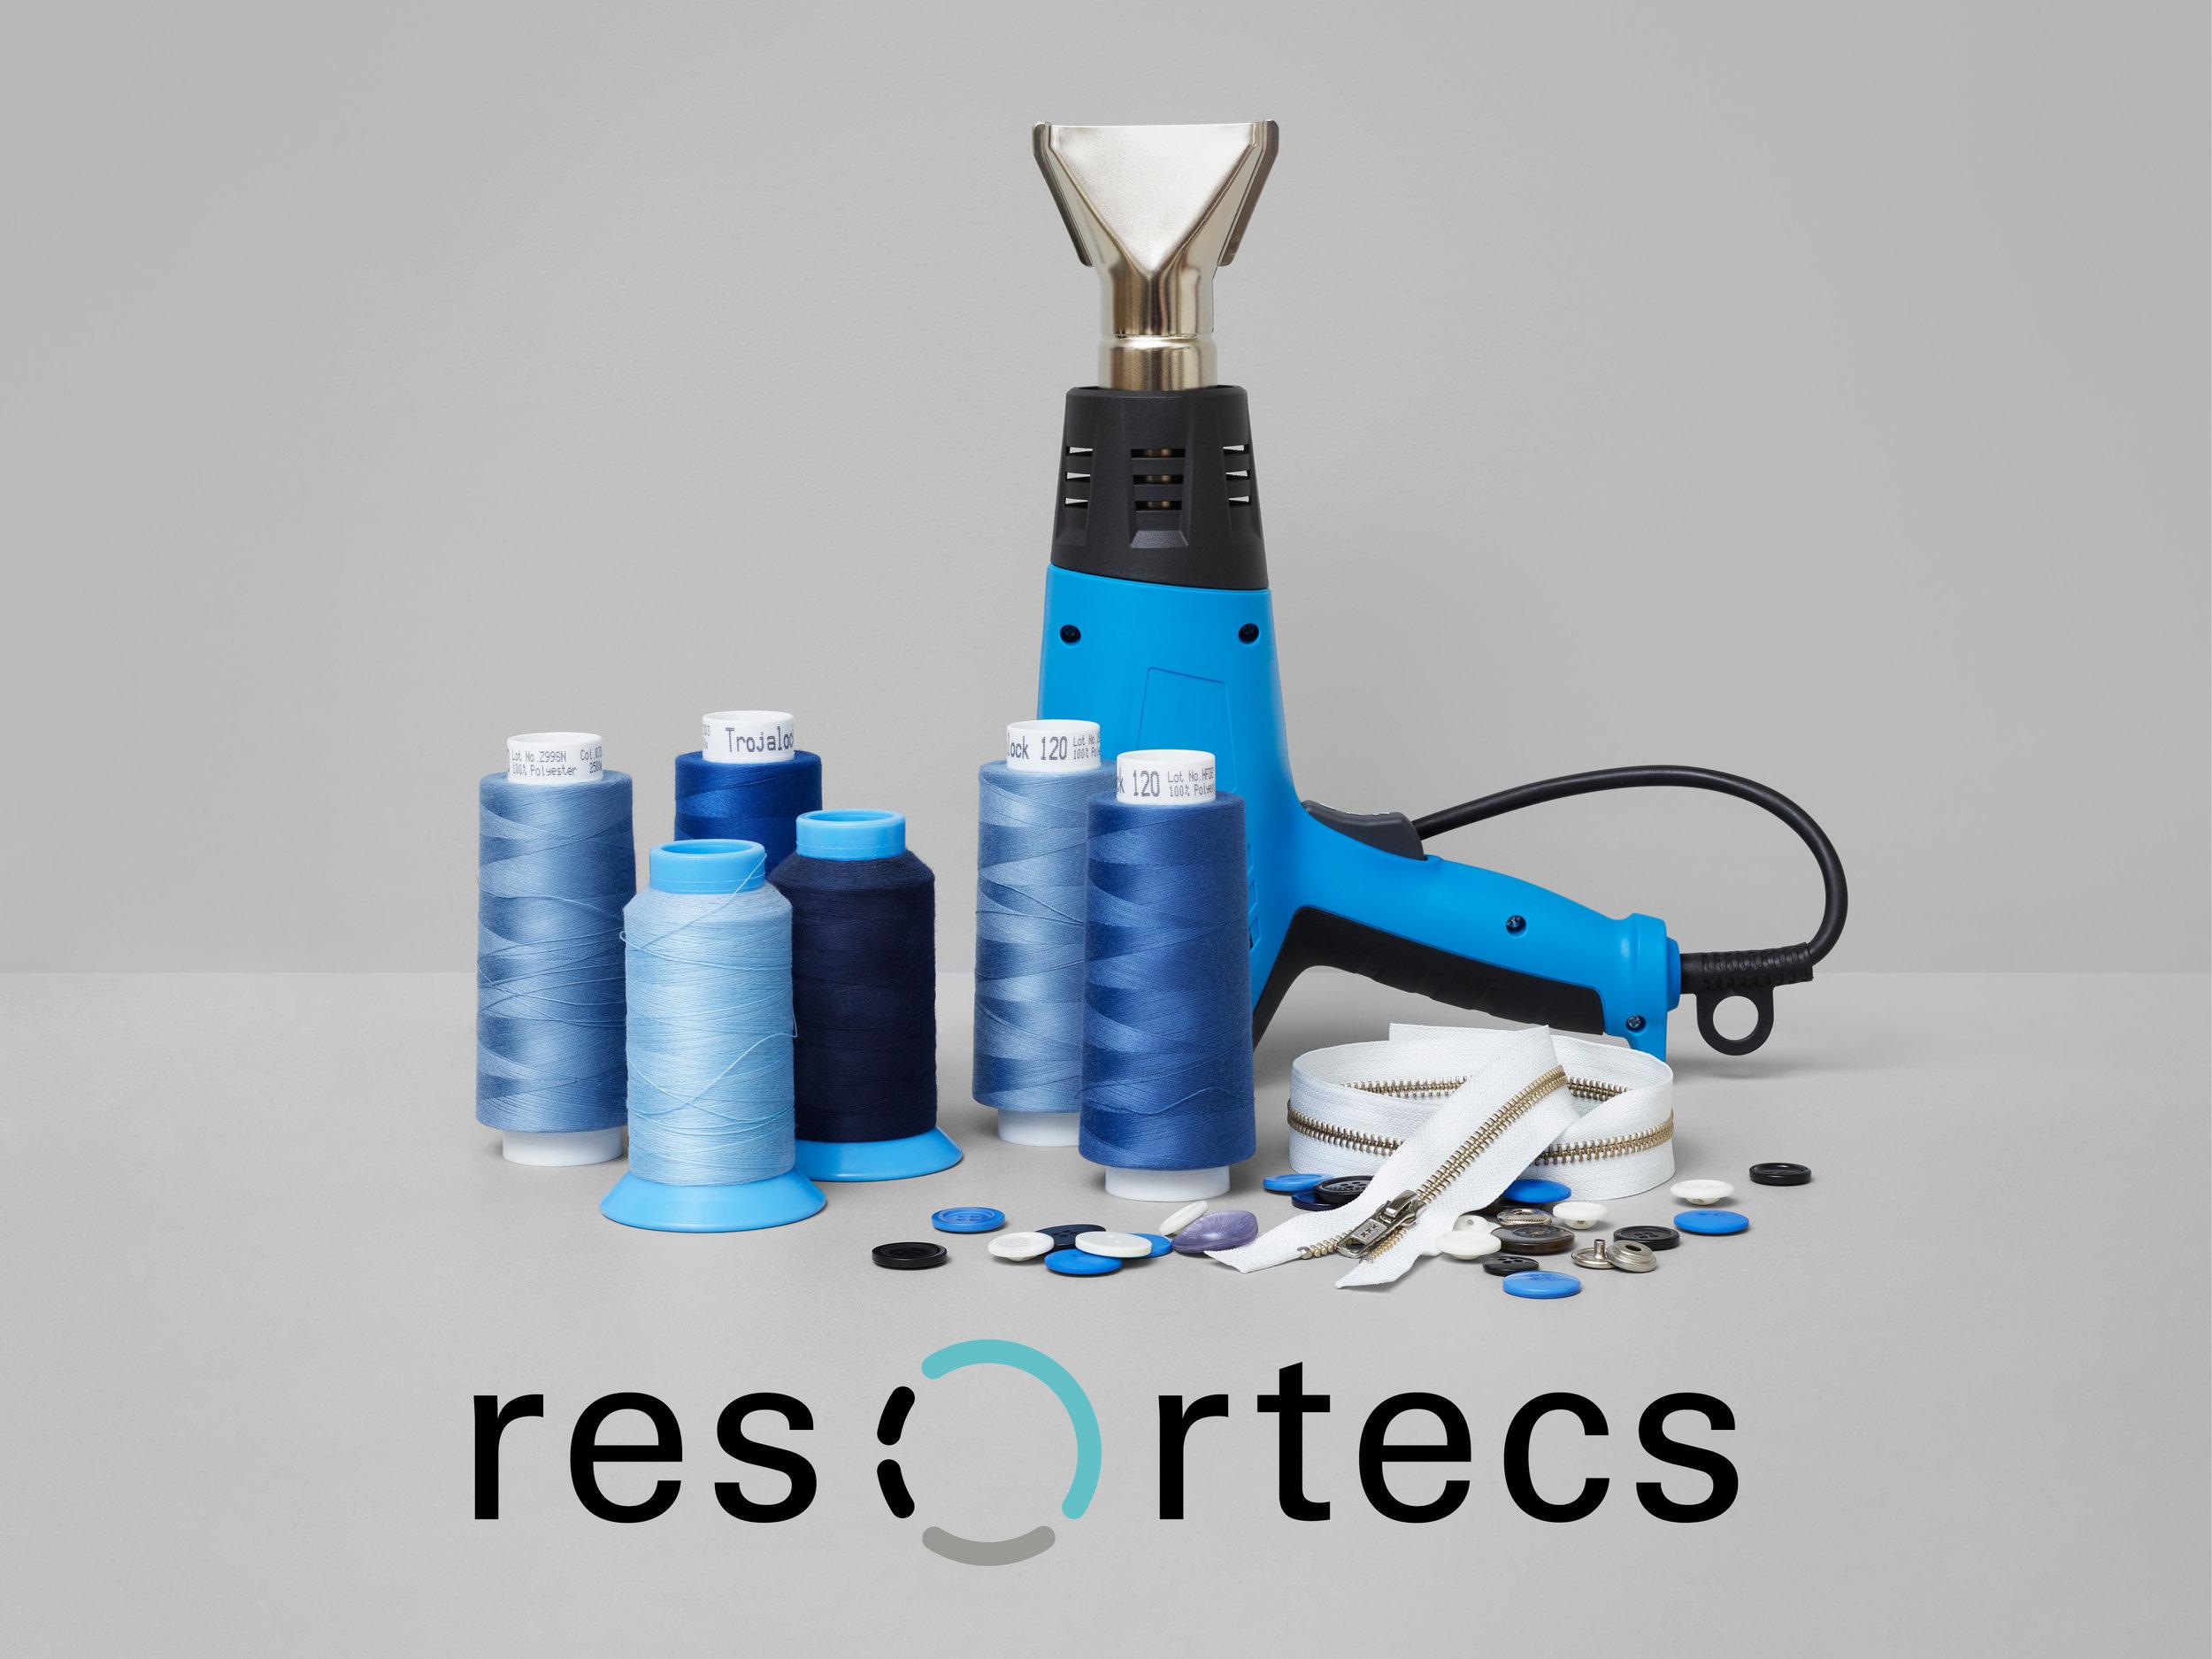 Resortecs Branding Chloe